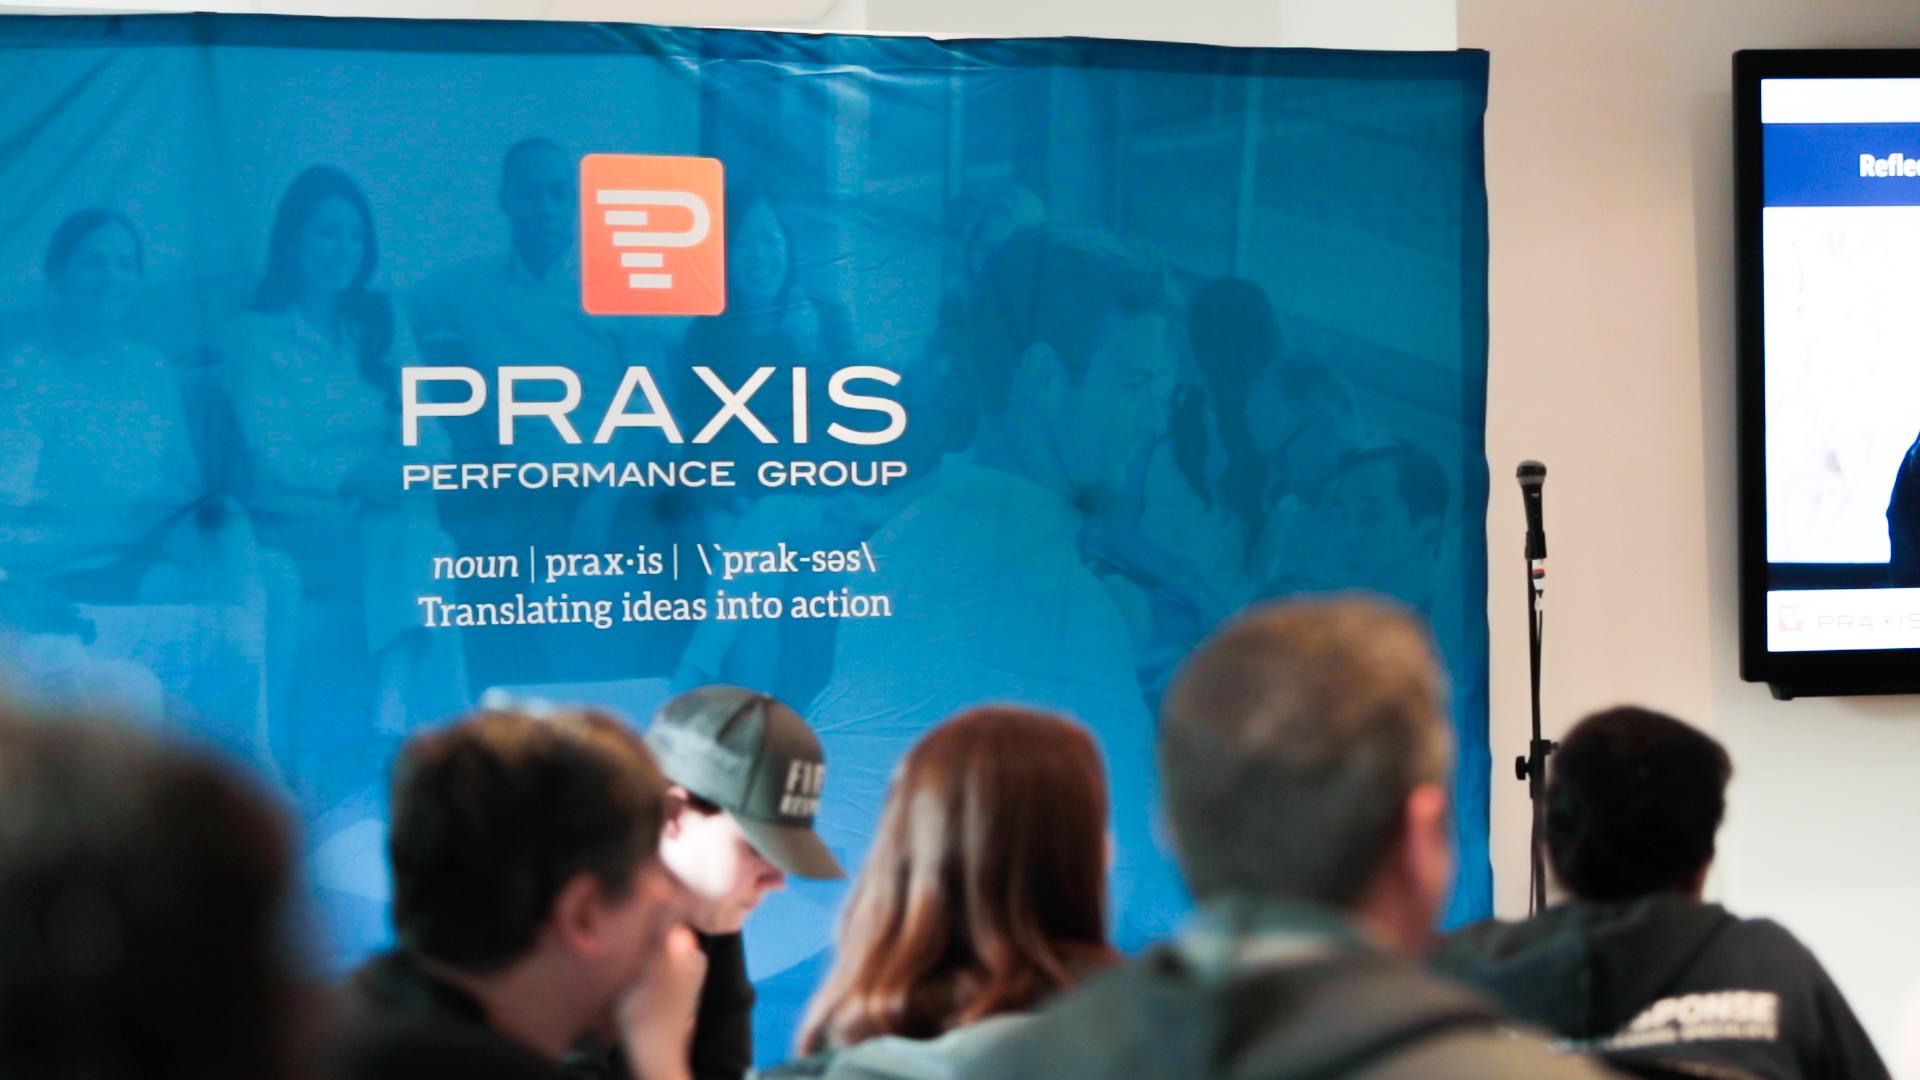 Praxis & FR Repectful Work Place Video.00_00_01_07.Still001.jpg